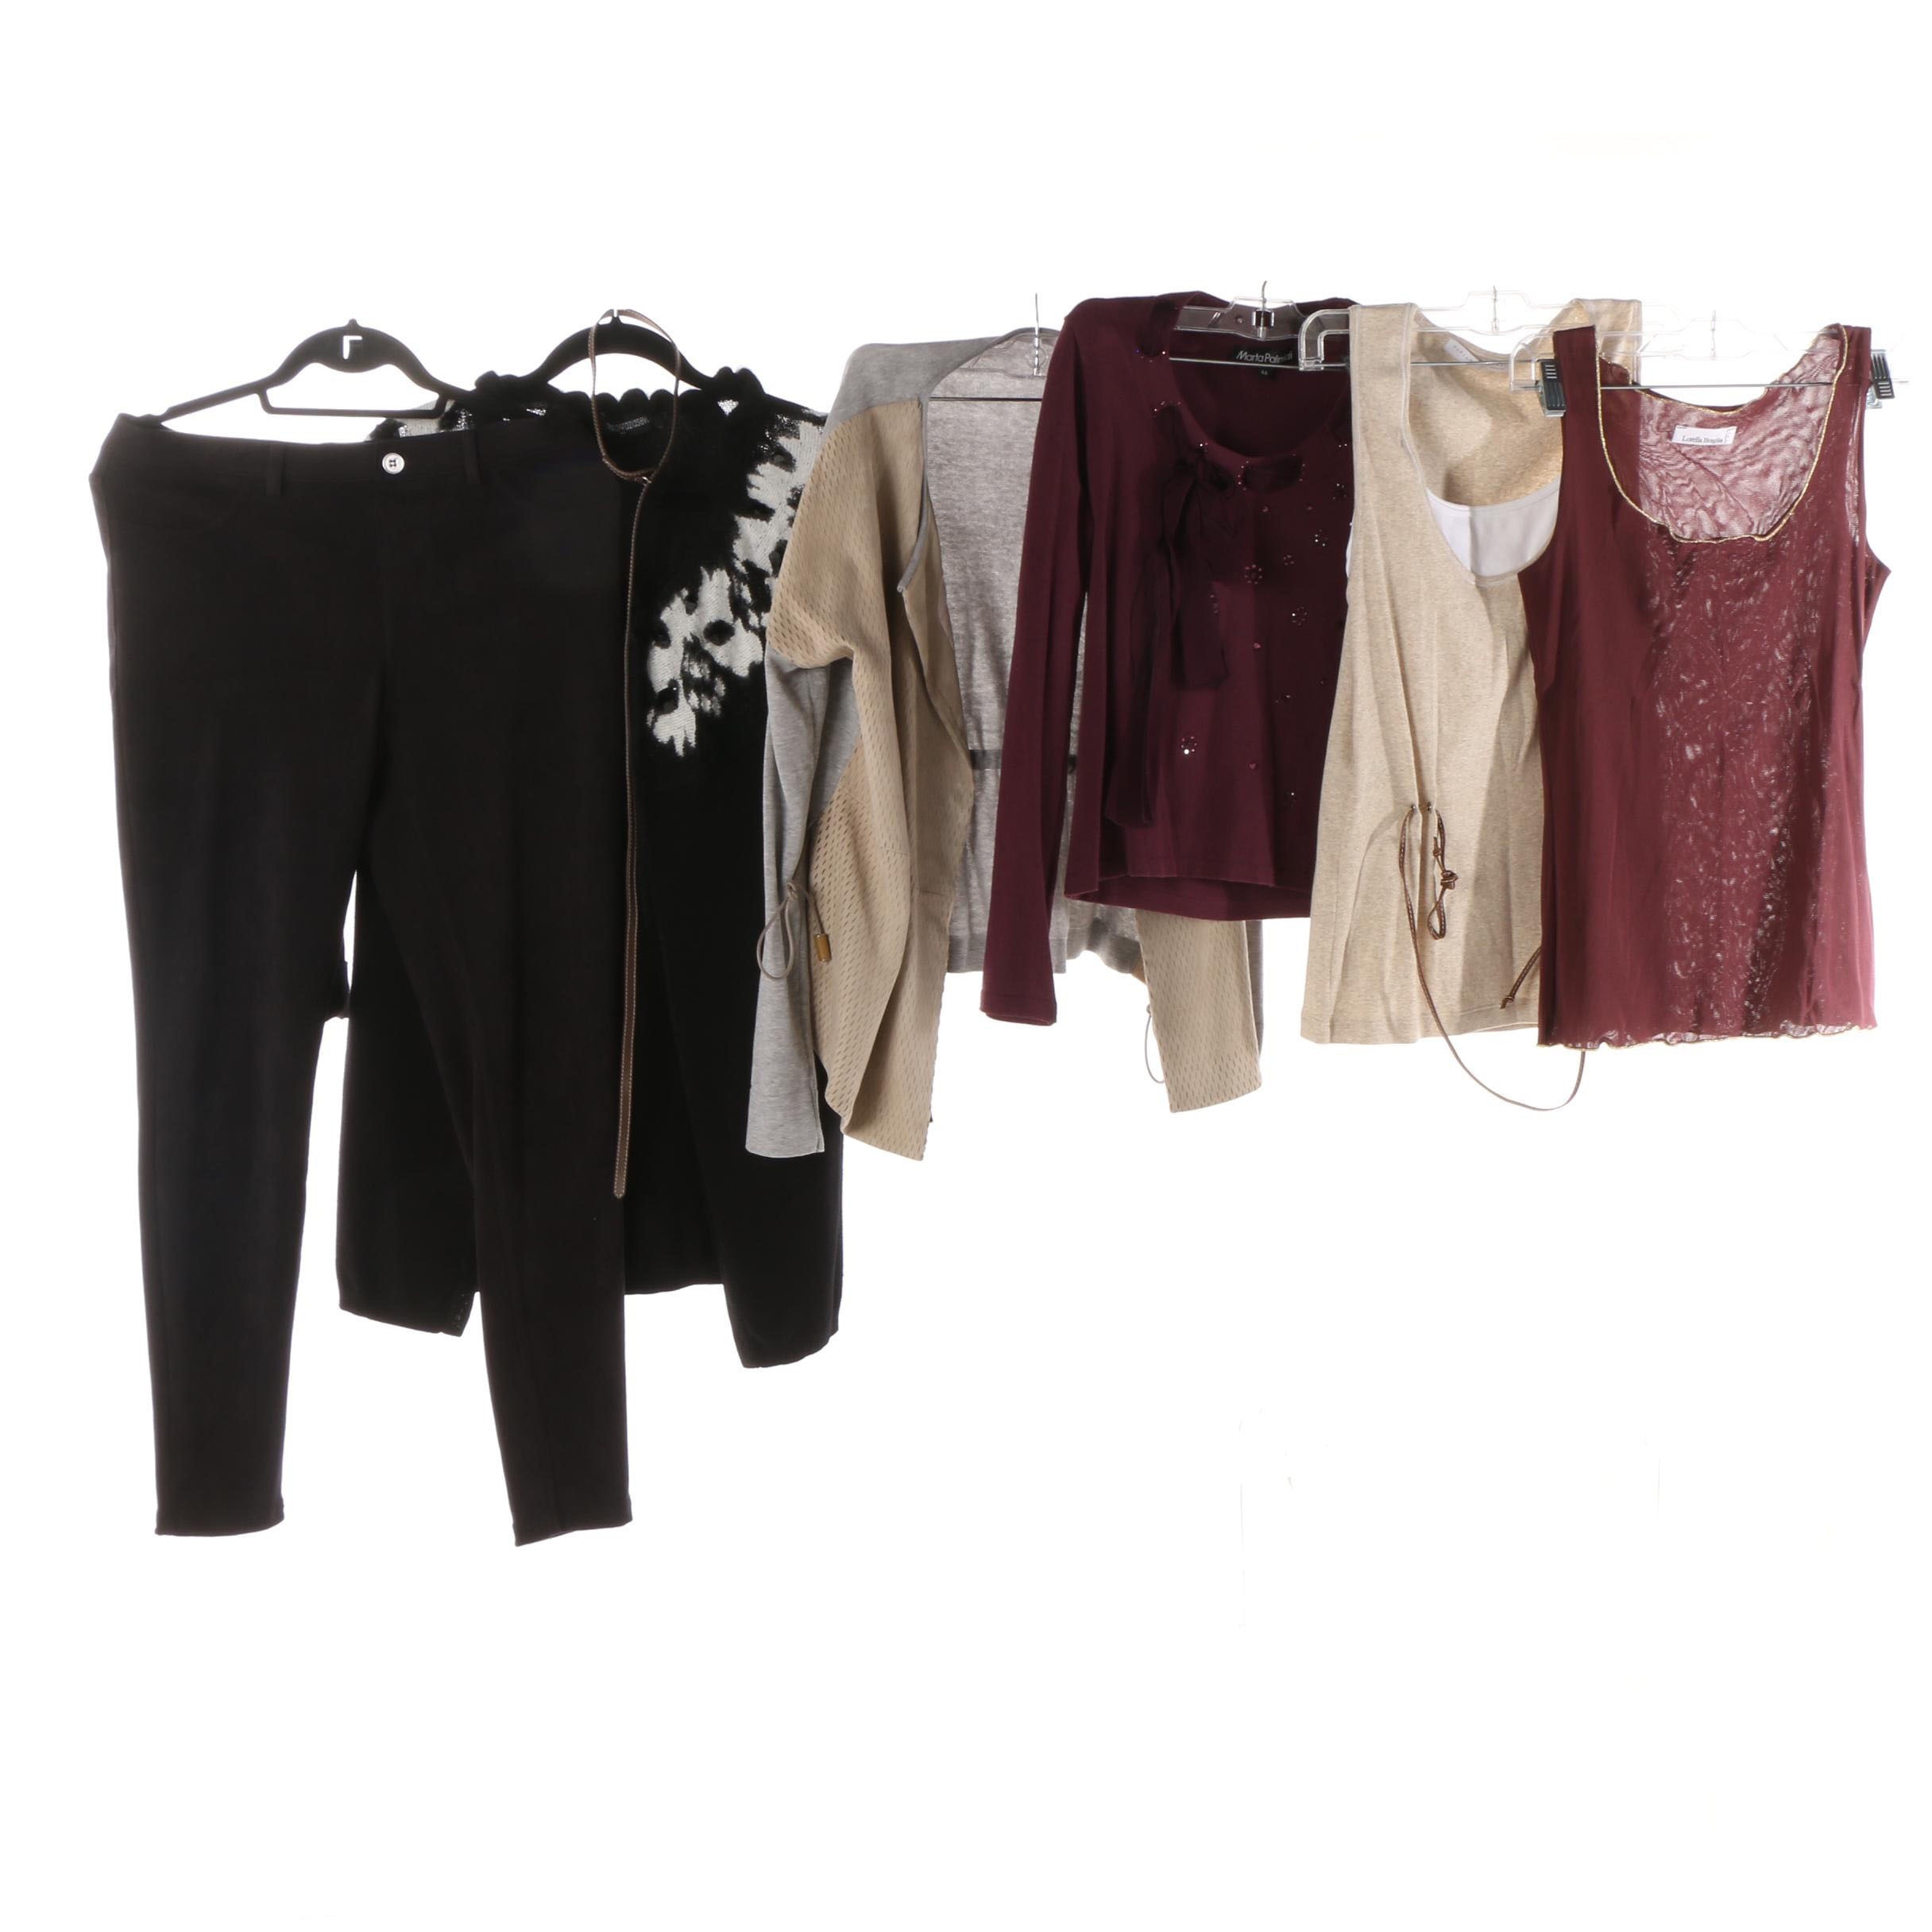 Women's Sweaters, Tops and Pant Including Fabiana Philippi and Lorella Braglia